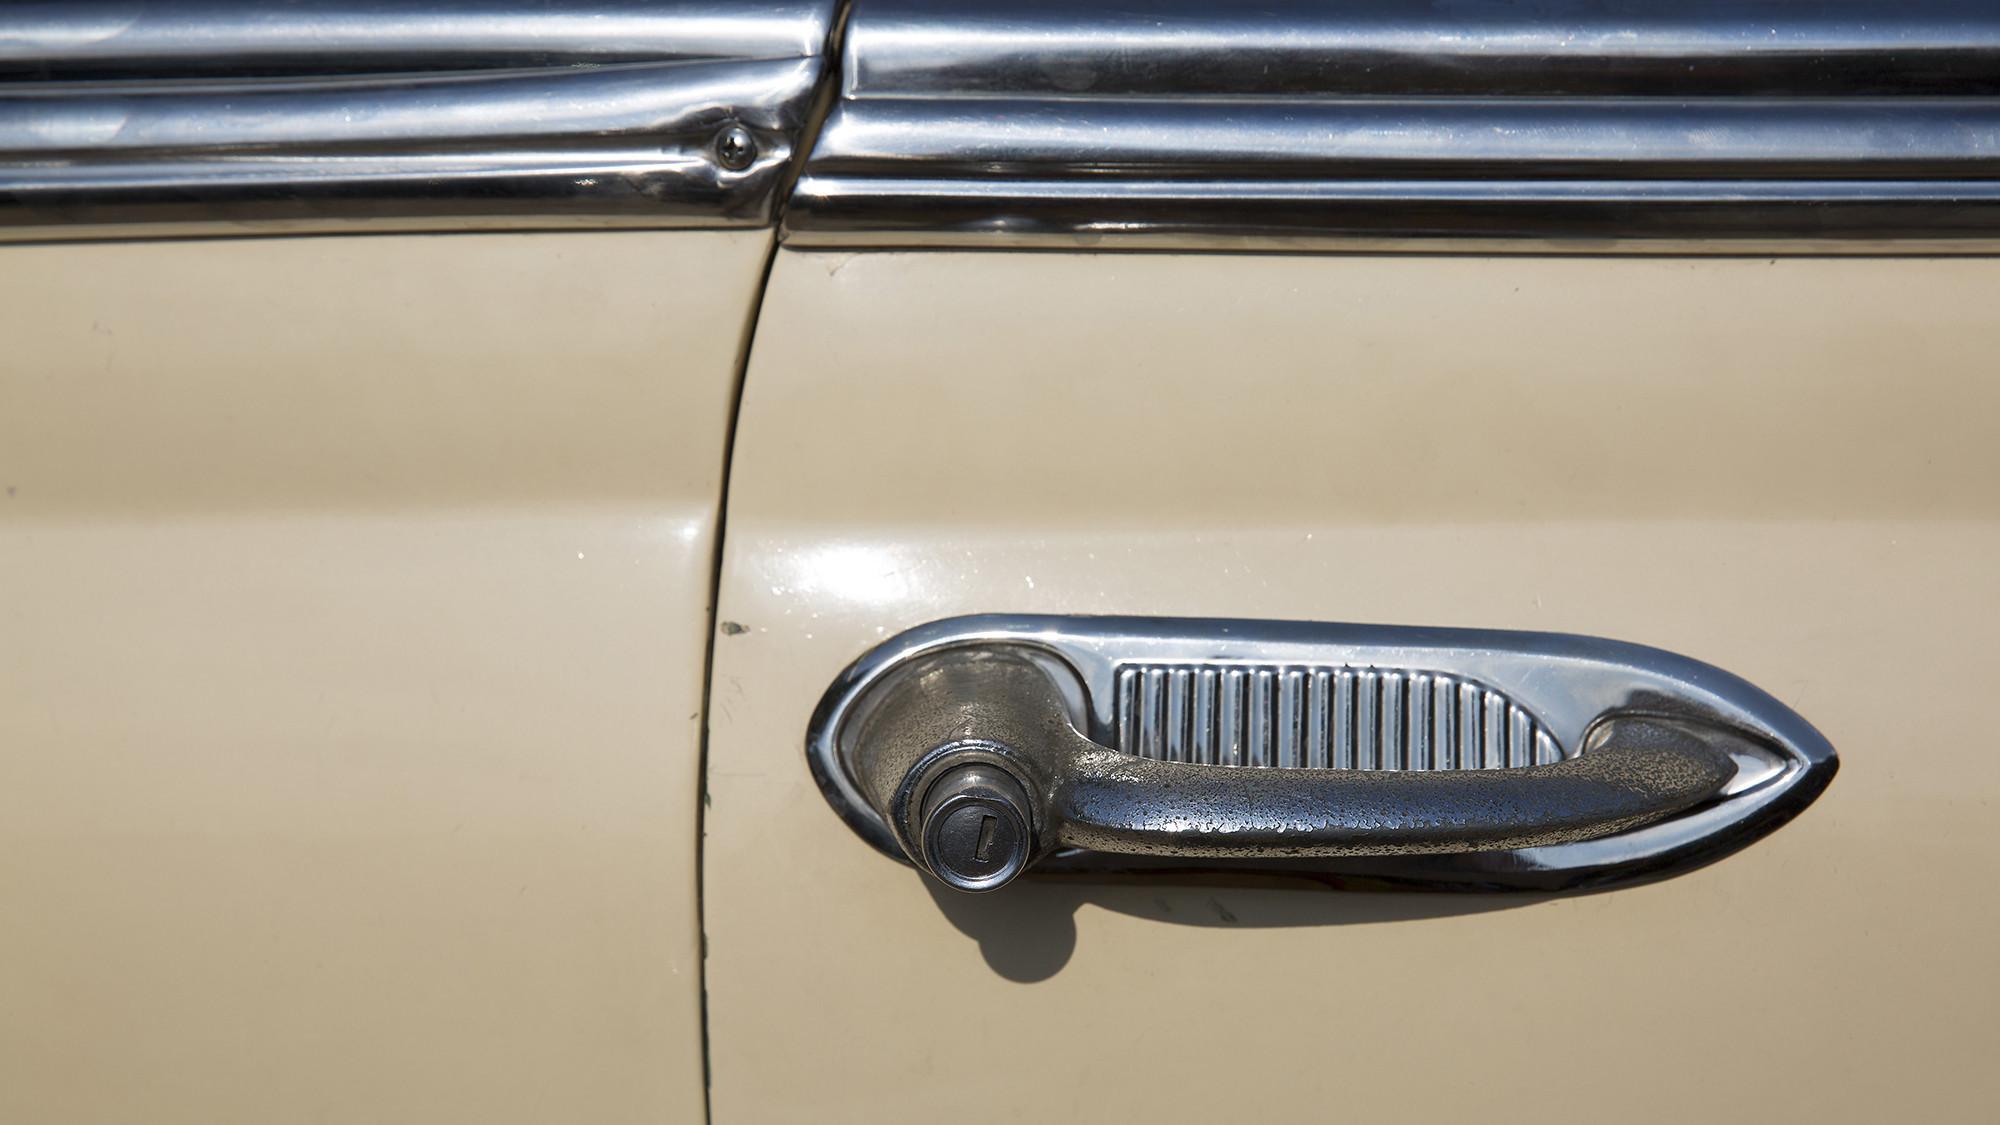 vintage car door handle. Vintage Car Door Handles Cuba Cars - Los Angeles Times Handle